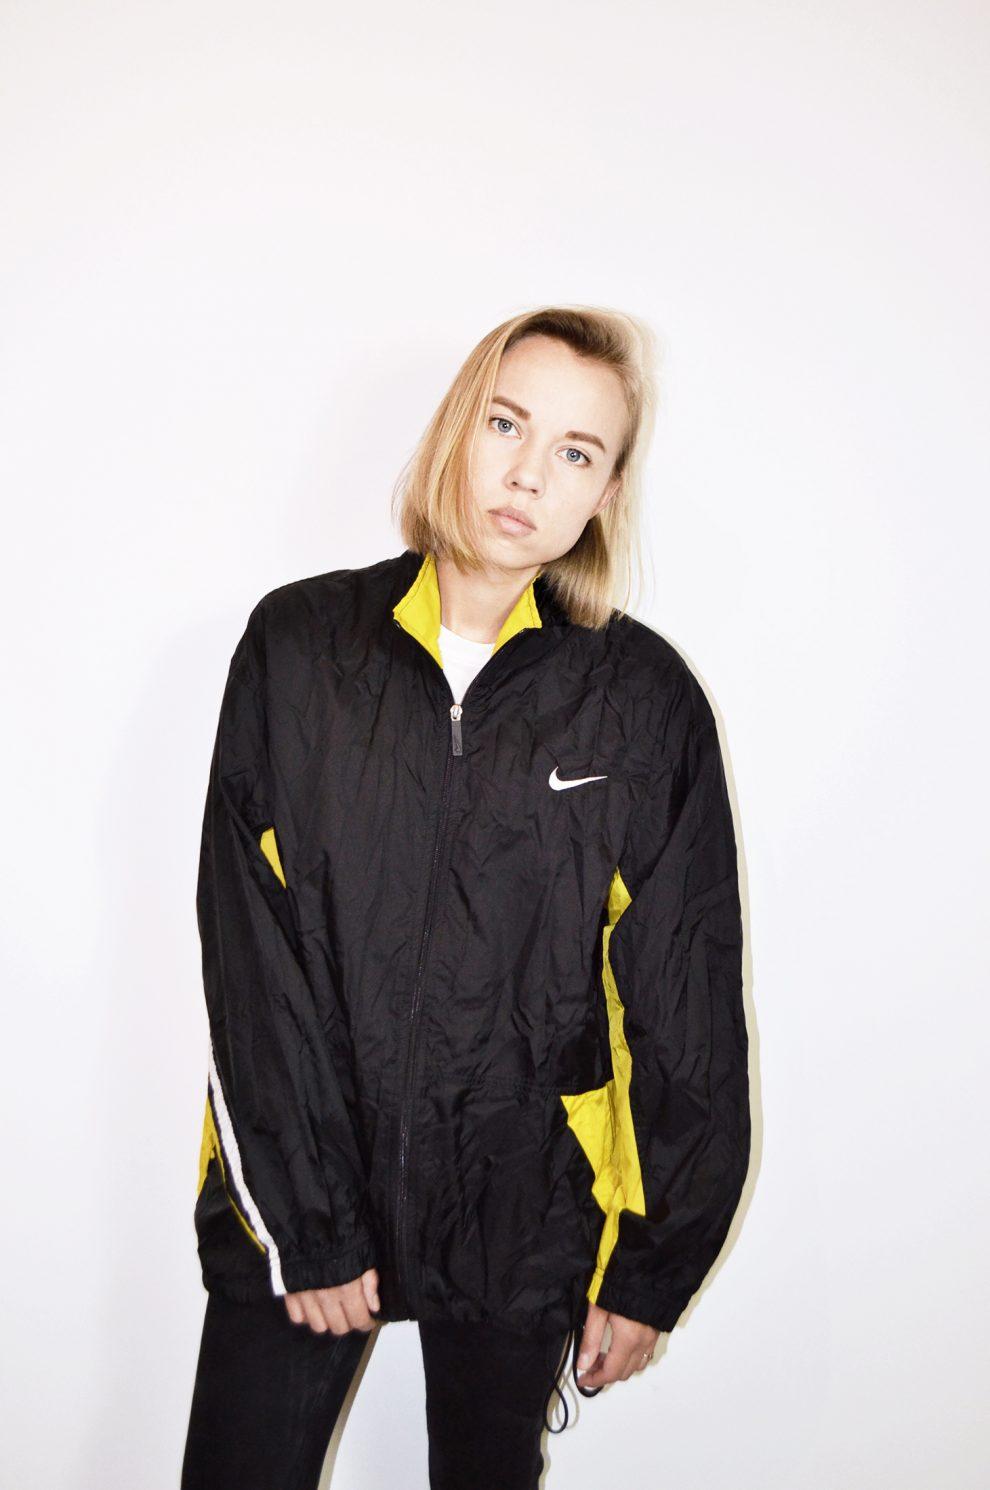 e2597410d2c1 Nike vintage sport shell jacket - HOT MILK - Branded sport clothing